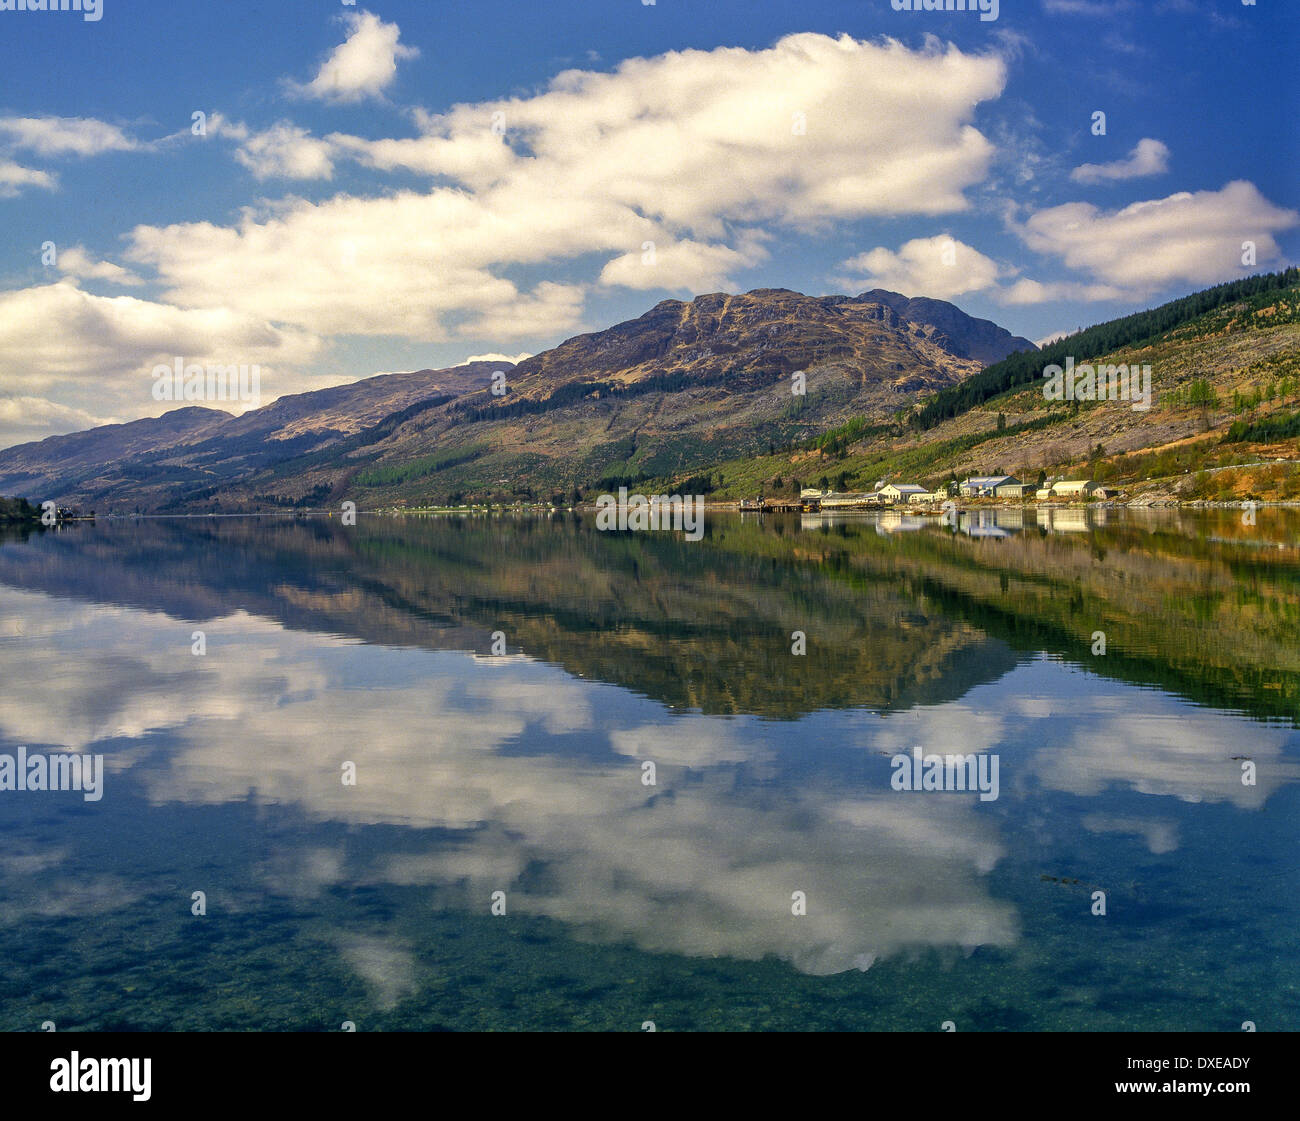 Peaceful reflections on Long Long, Arrochar - Stock Image